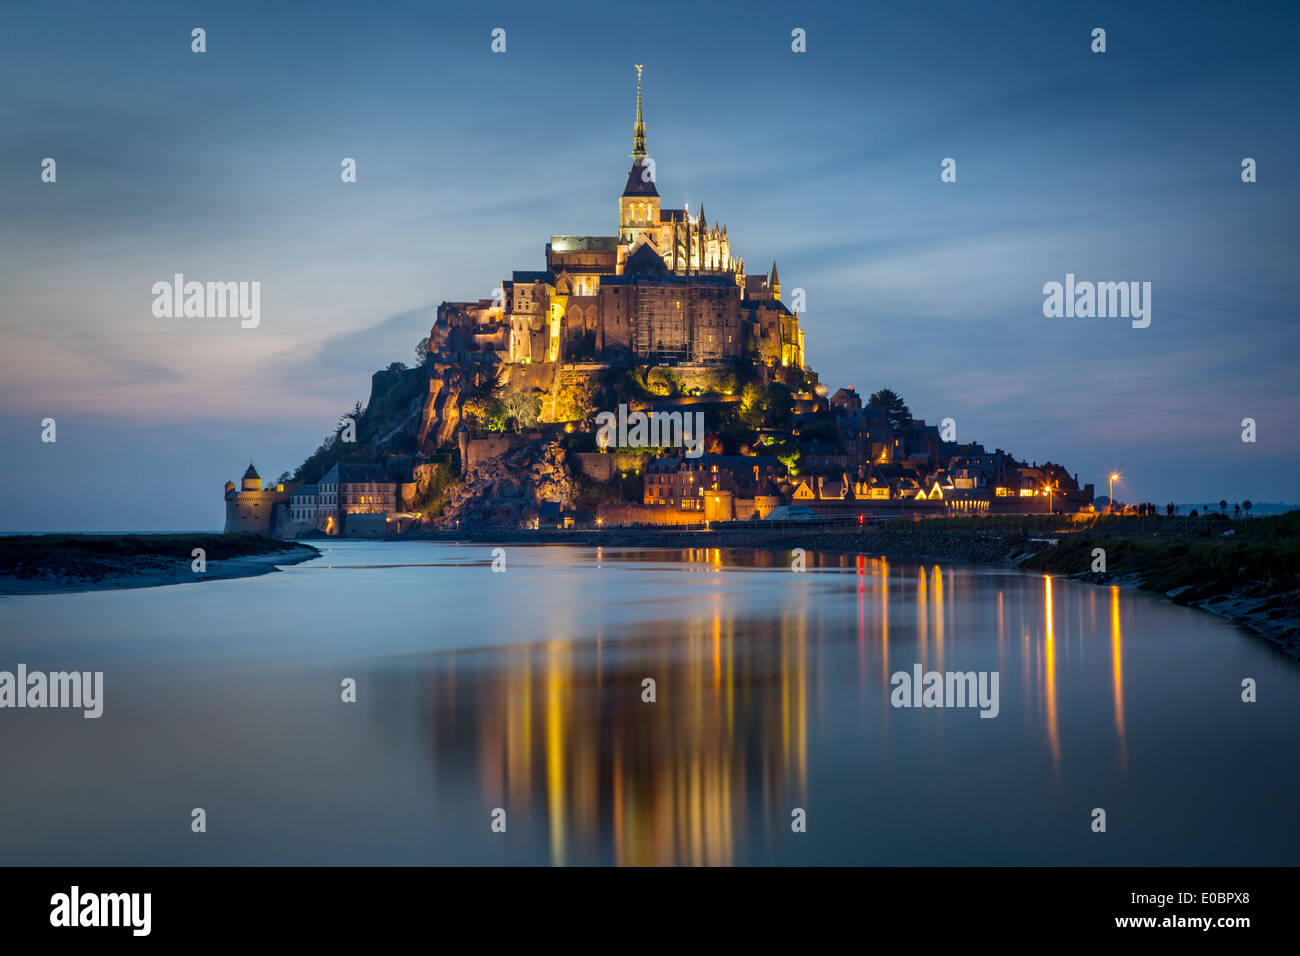 Twilight over Le Mont Saint Michel, Normandy France - Stock Image